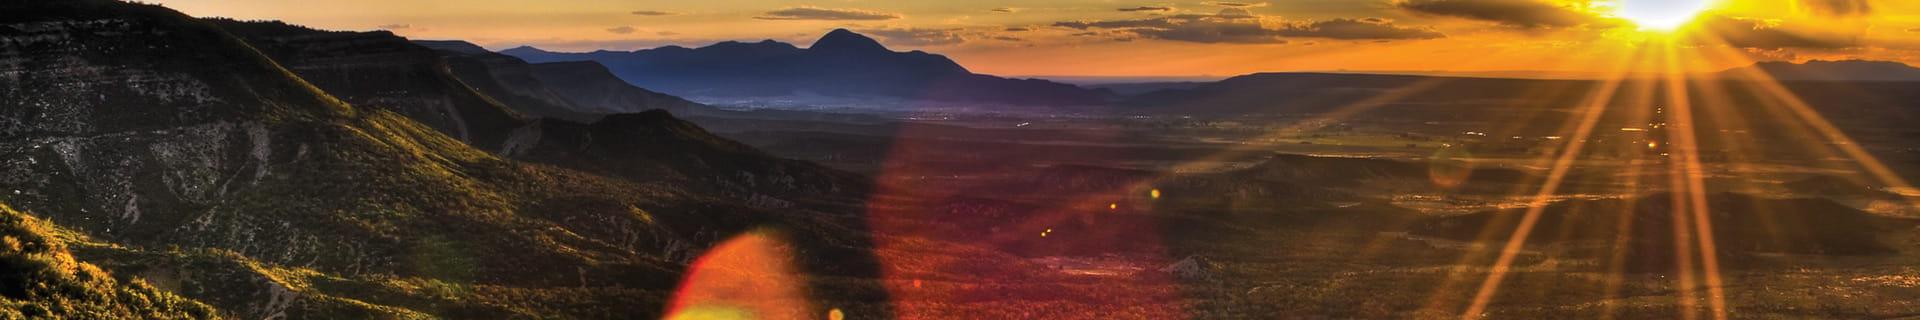 sunbeams-from-sunset-over-Colorado-landscape